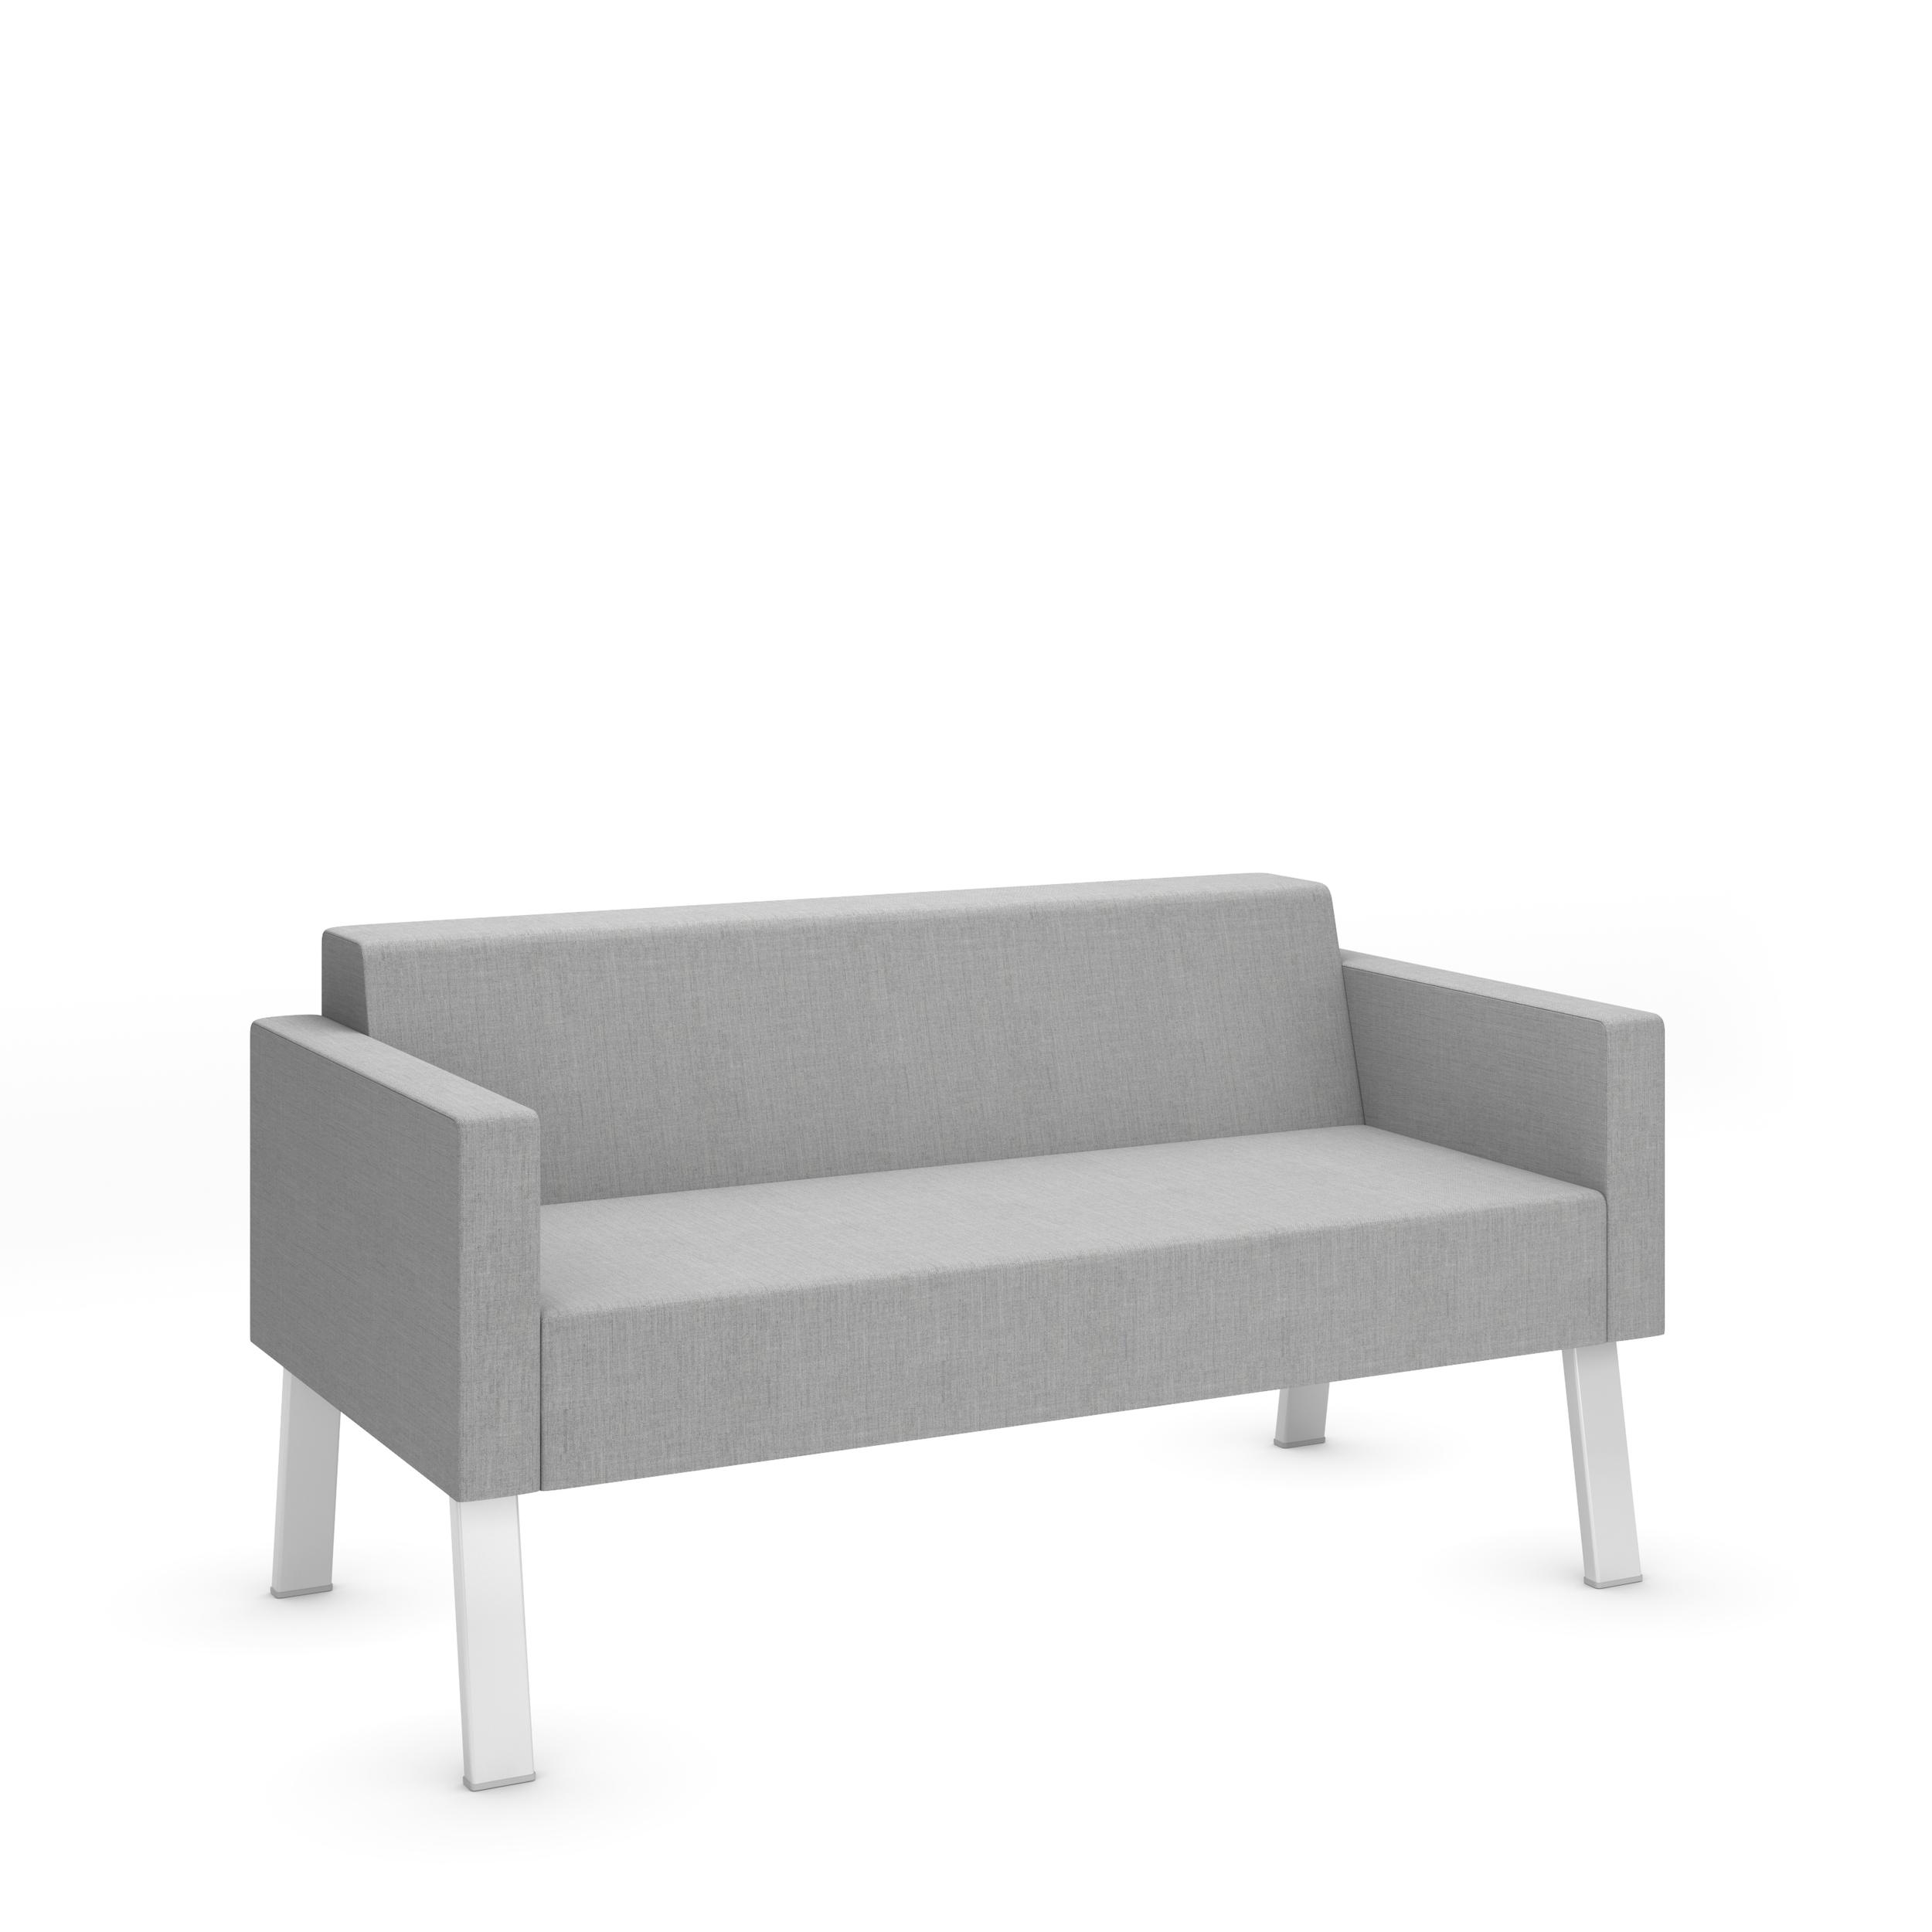 Double Lounge - No Power.jpg